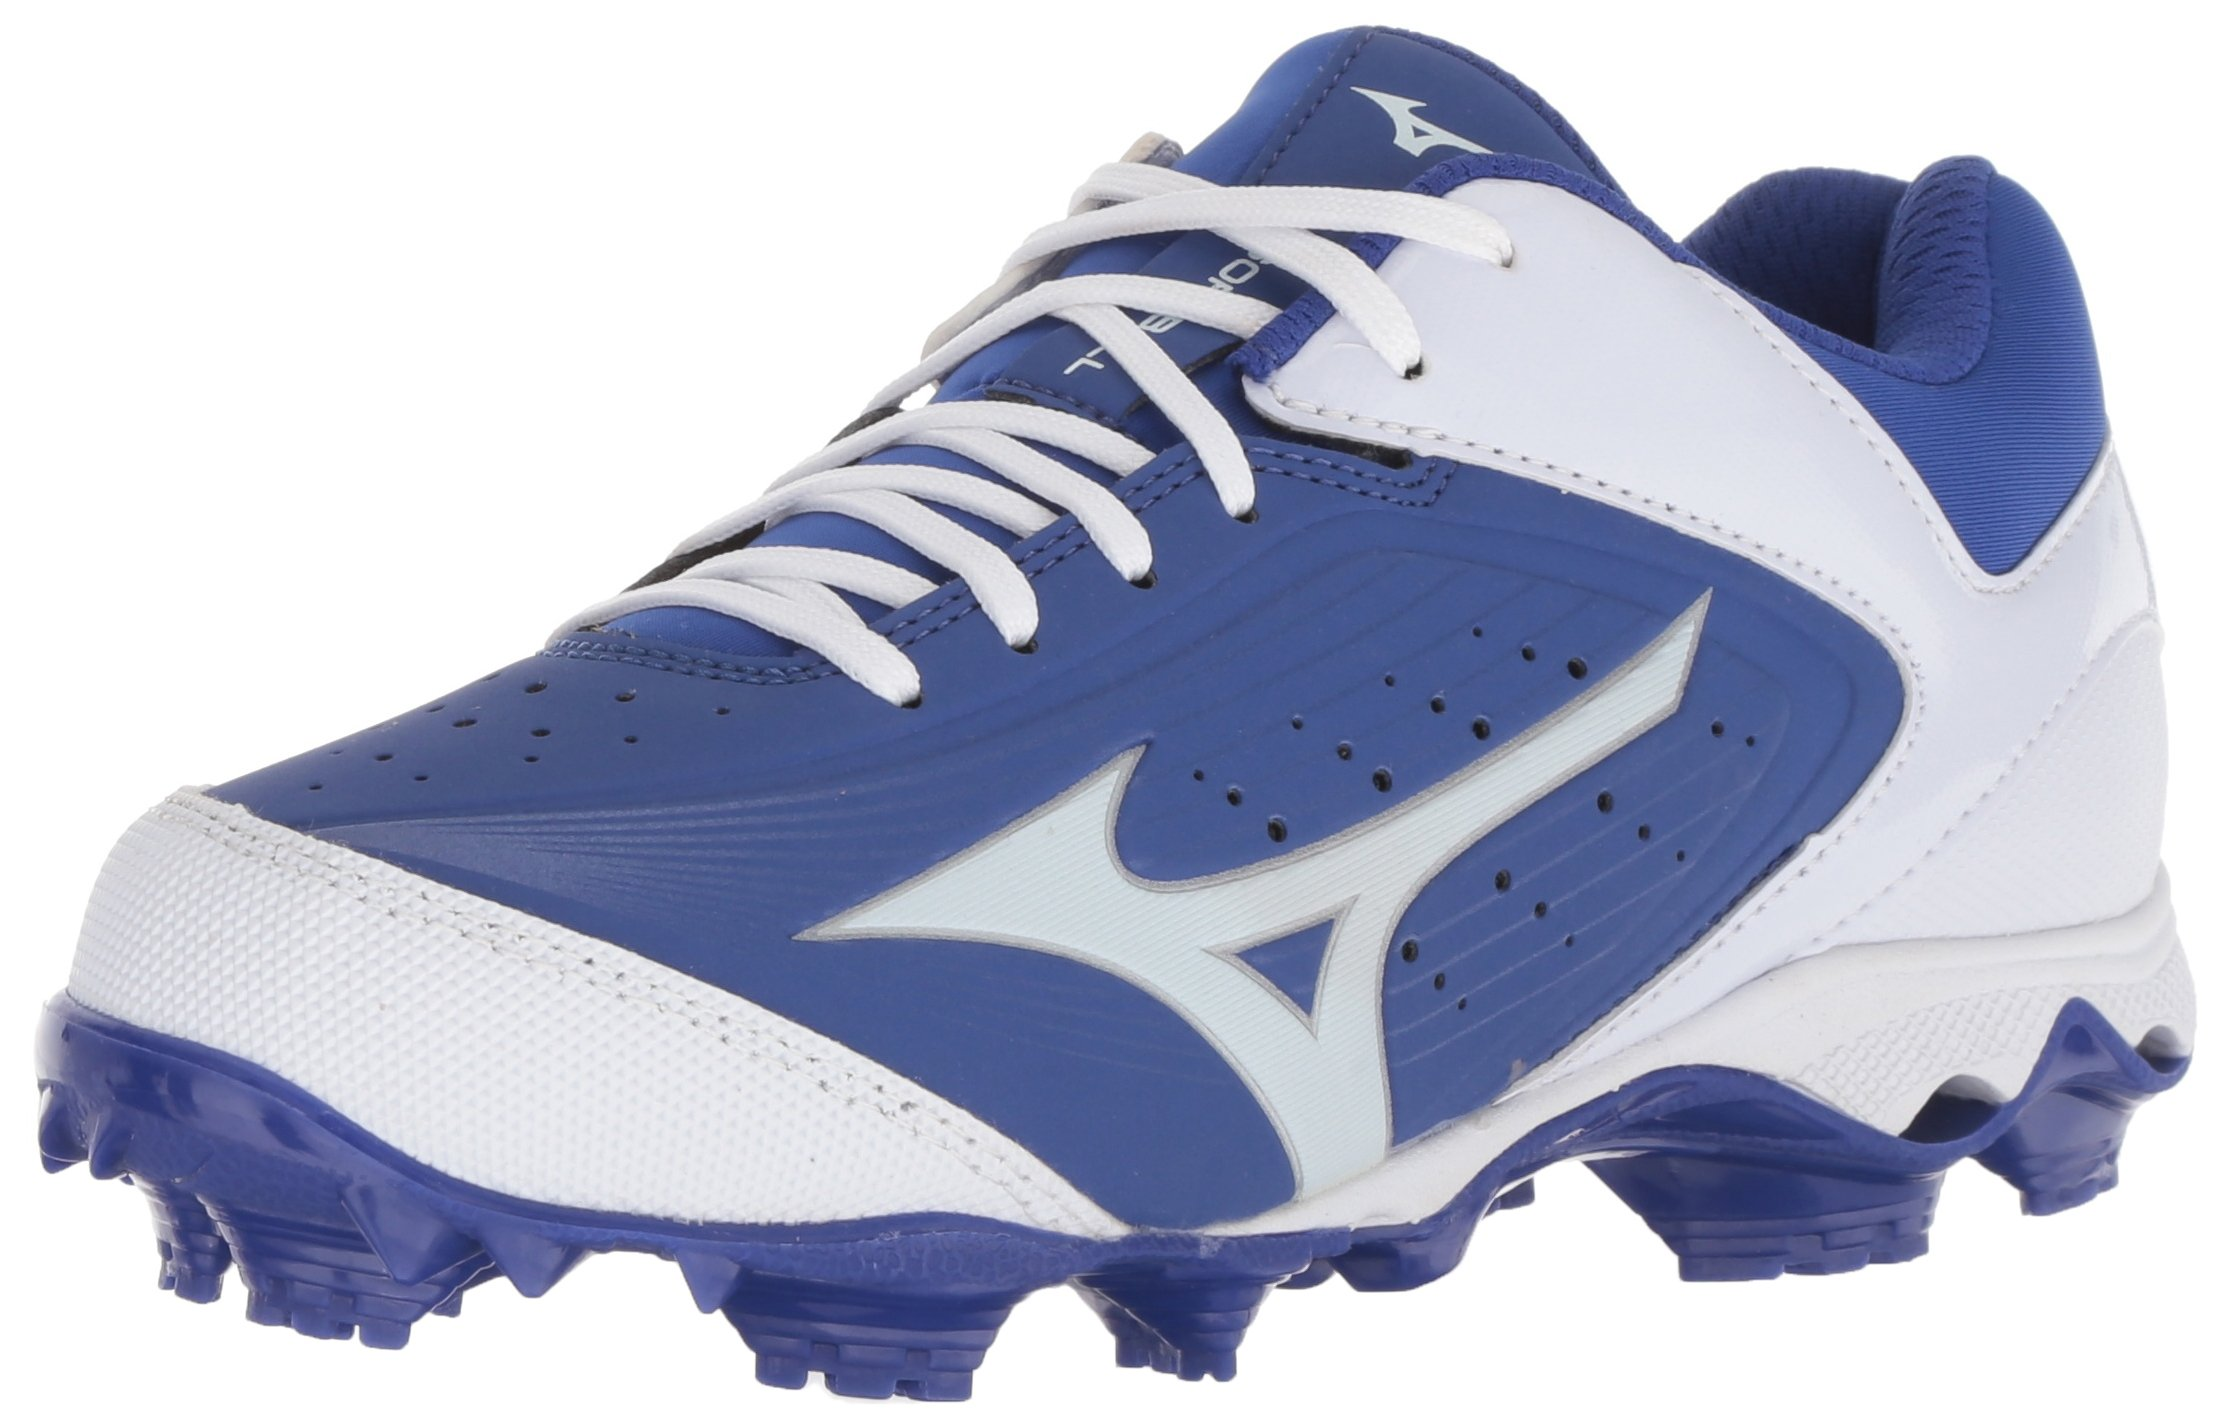 Mizuno Women's 9-Spike Advanced Finch Elite 3 Fastpitch Cleat Softball Shoe, Royal/White, 10 B US by Mizuno